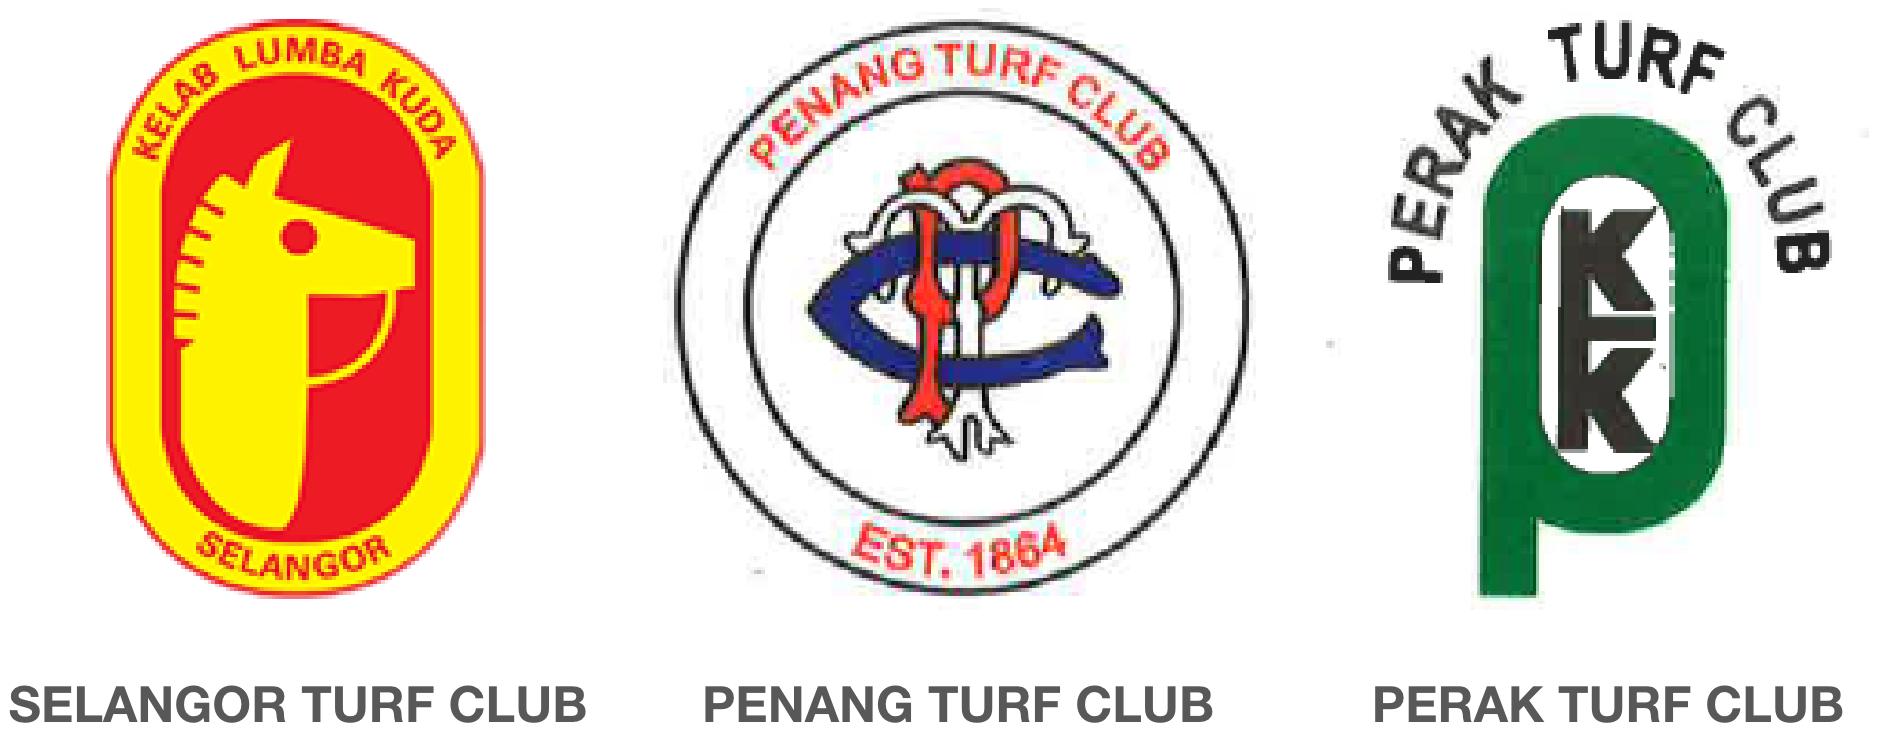 Malaysian Turf Clubs